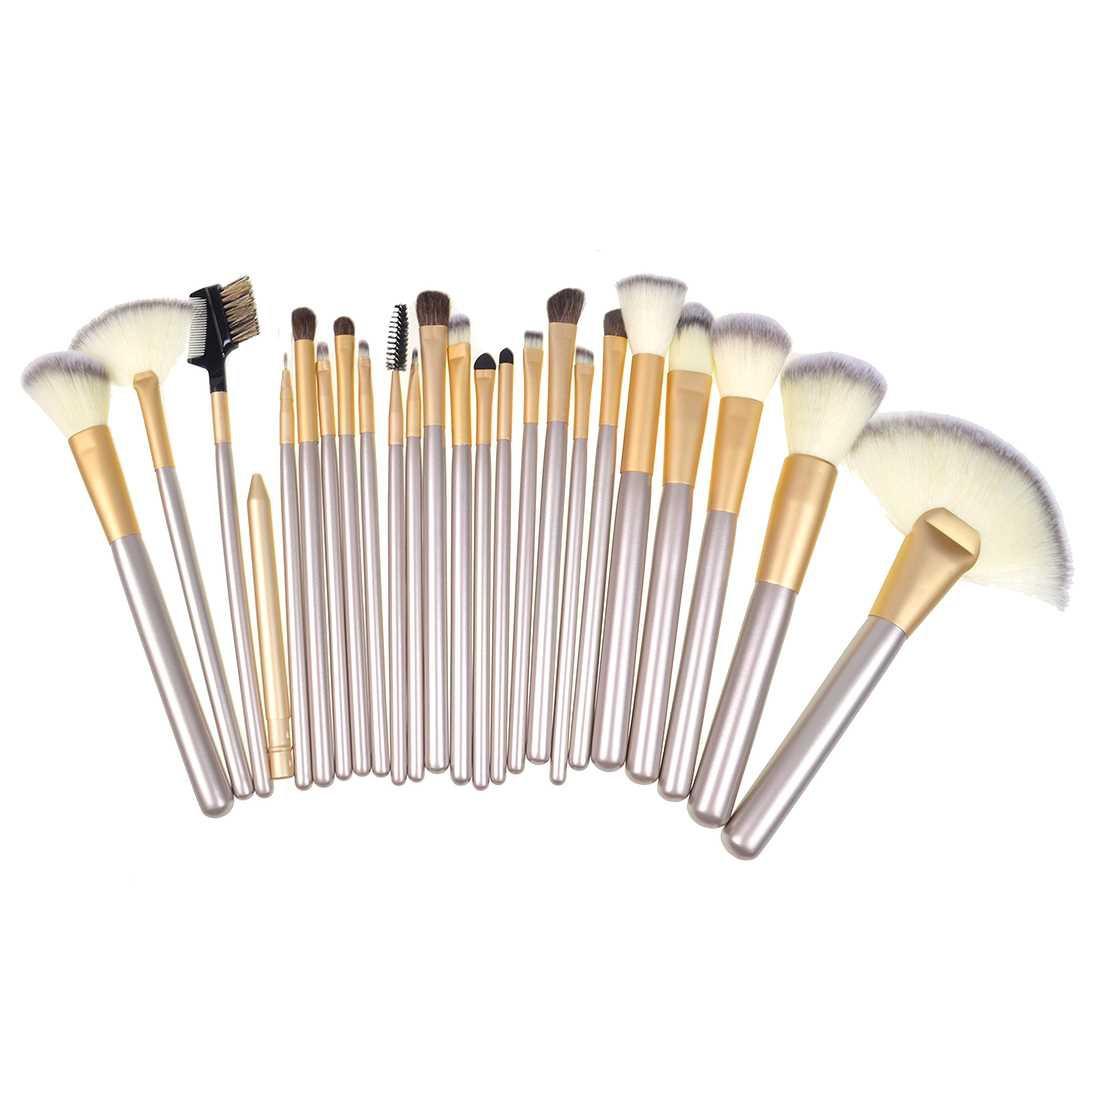 Hualiya Makeup Cosmetic Brush Set 24 Brushes with Bag (Beige)